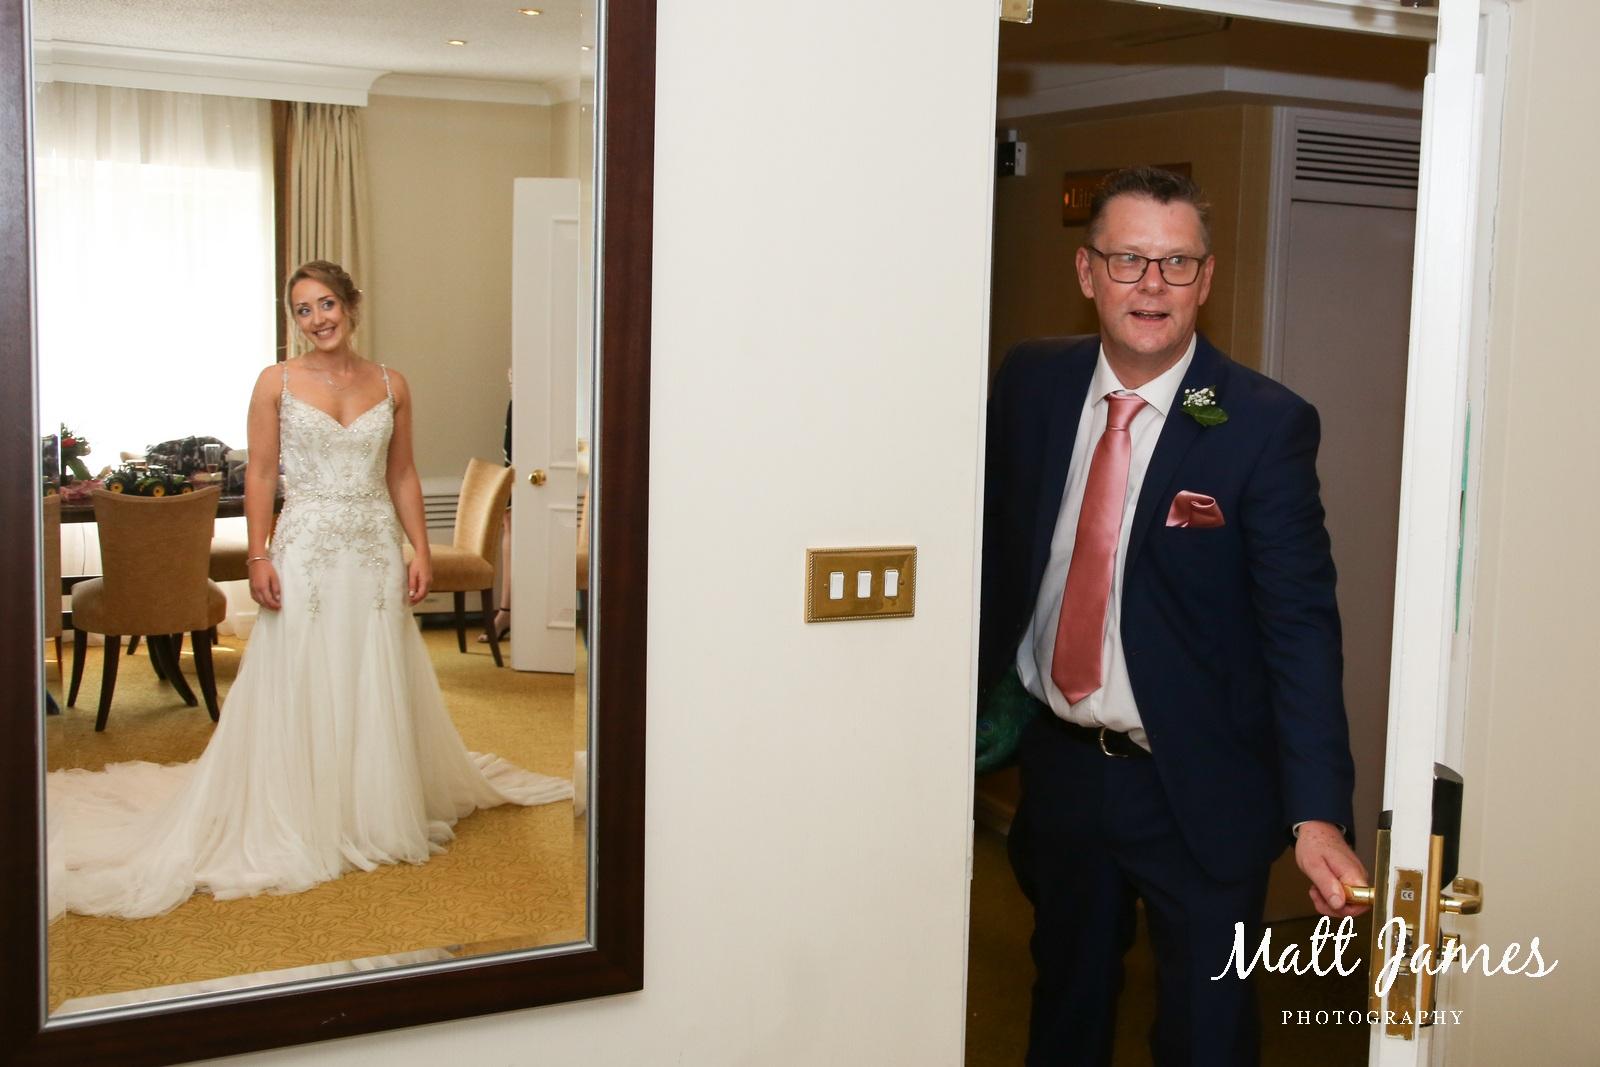 Matt-James-Photography-Wedding-photographer19